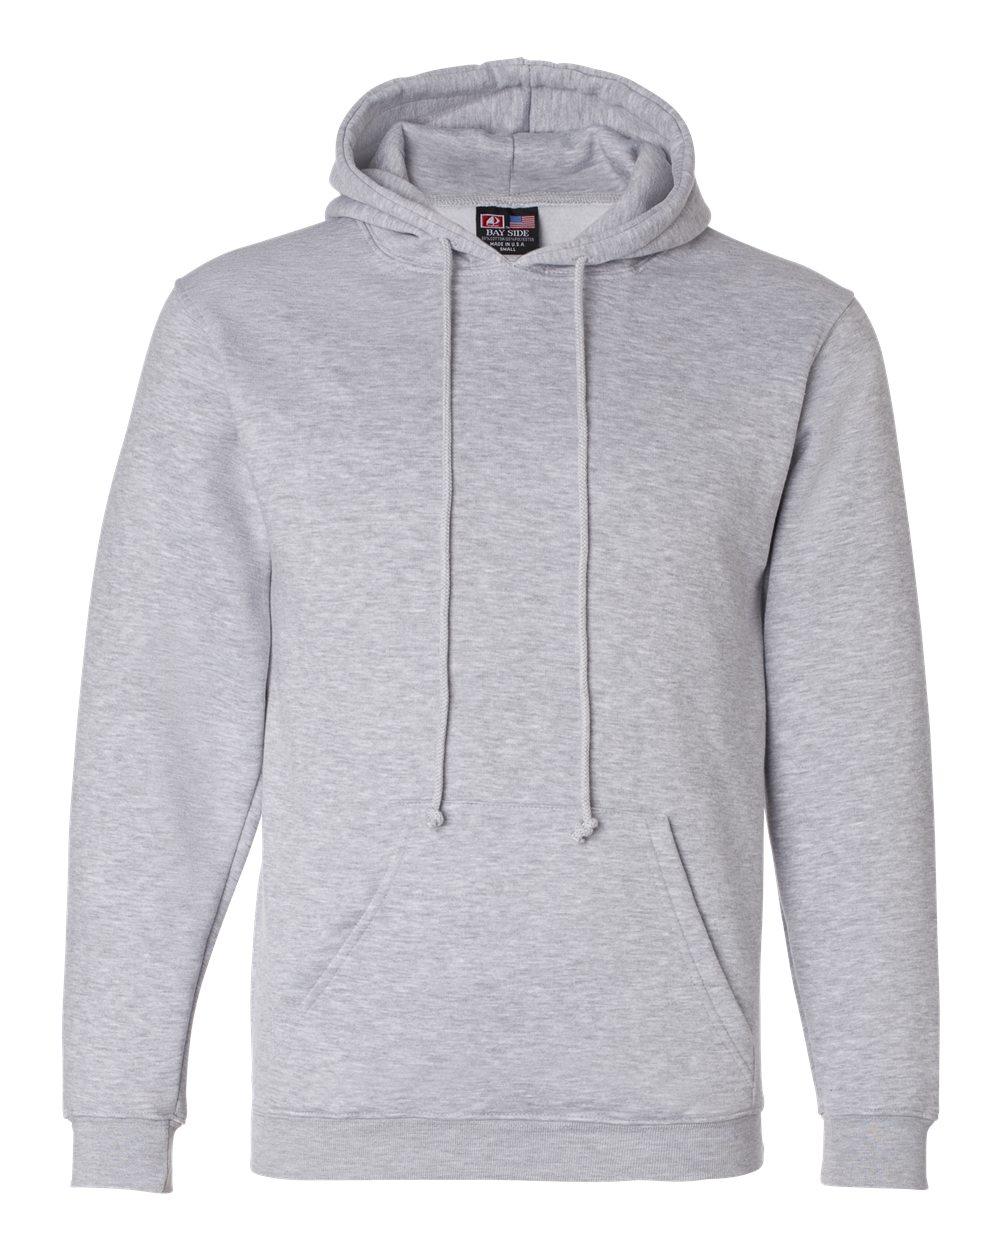 Bayside-Mens-Blank-USA-Made-Hooded-Sweatshirt-960-up-to-6XL miniature 15